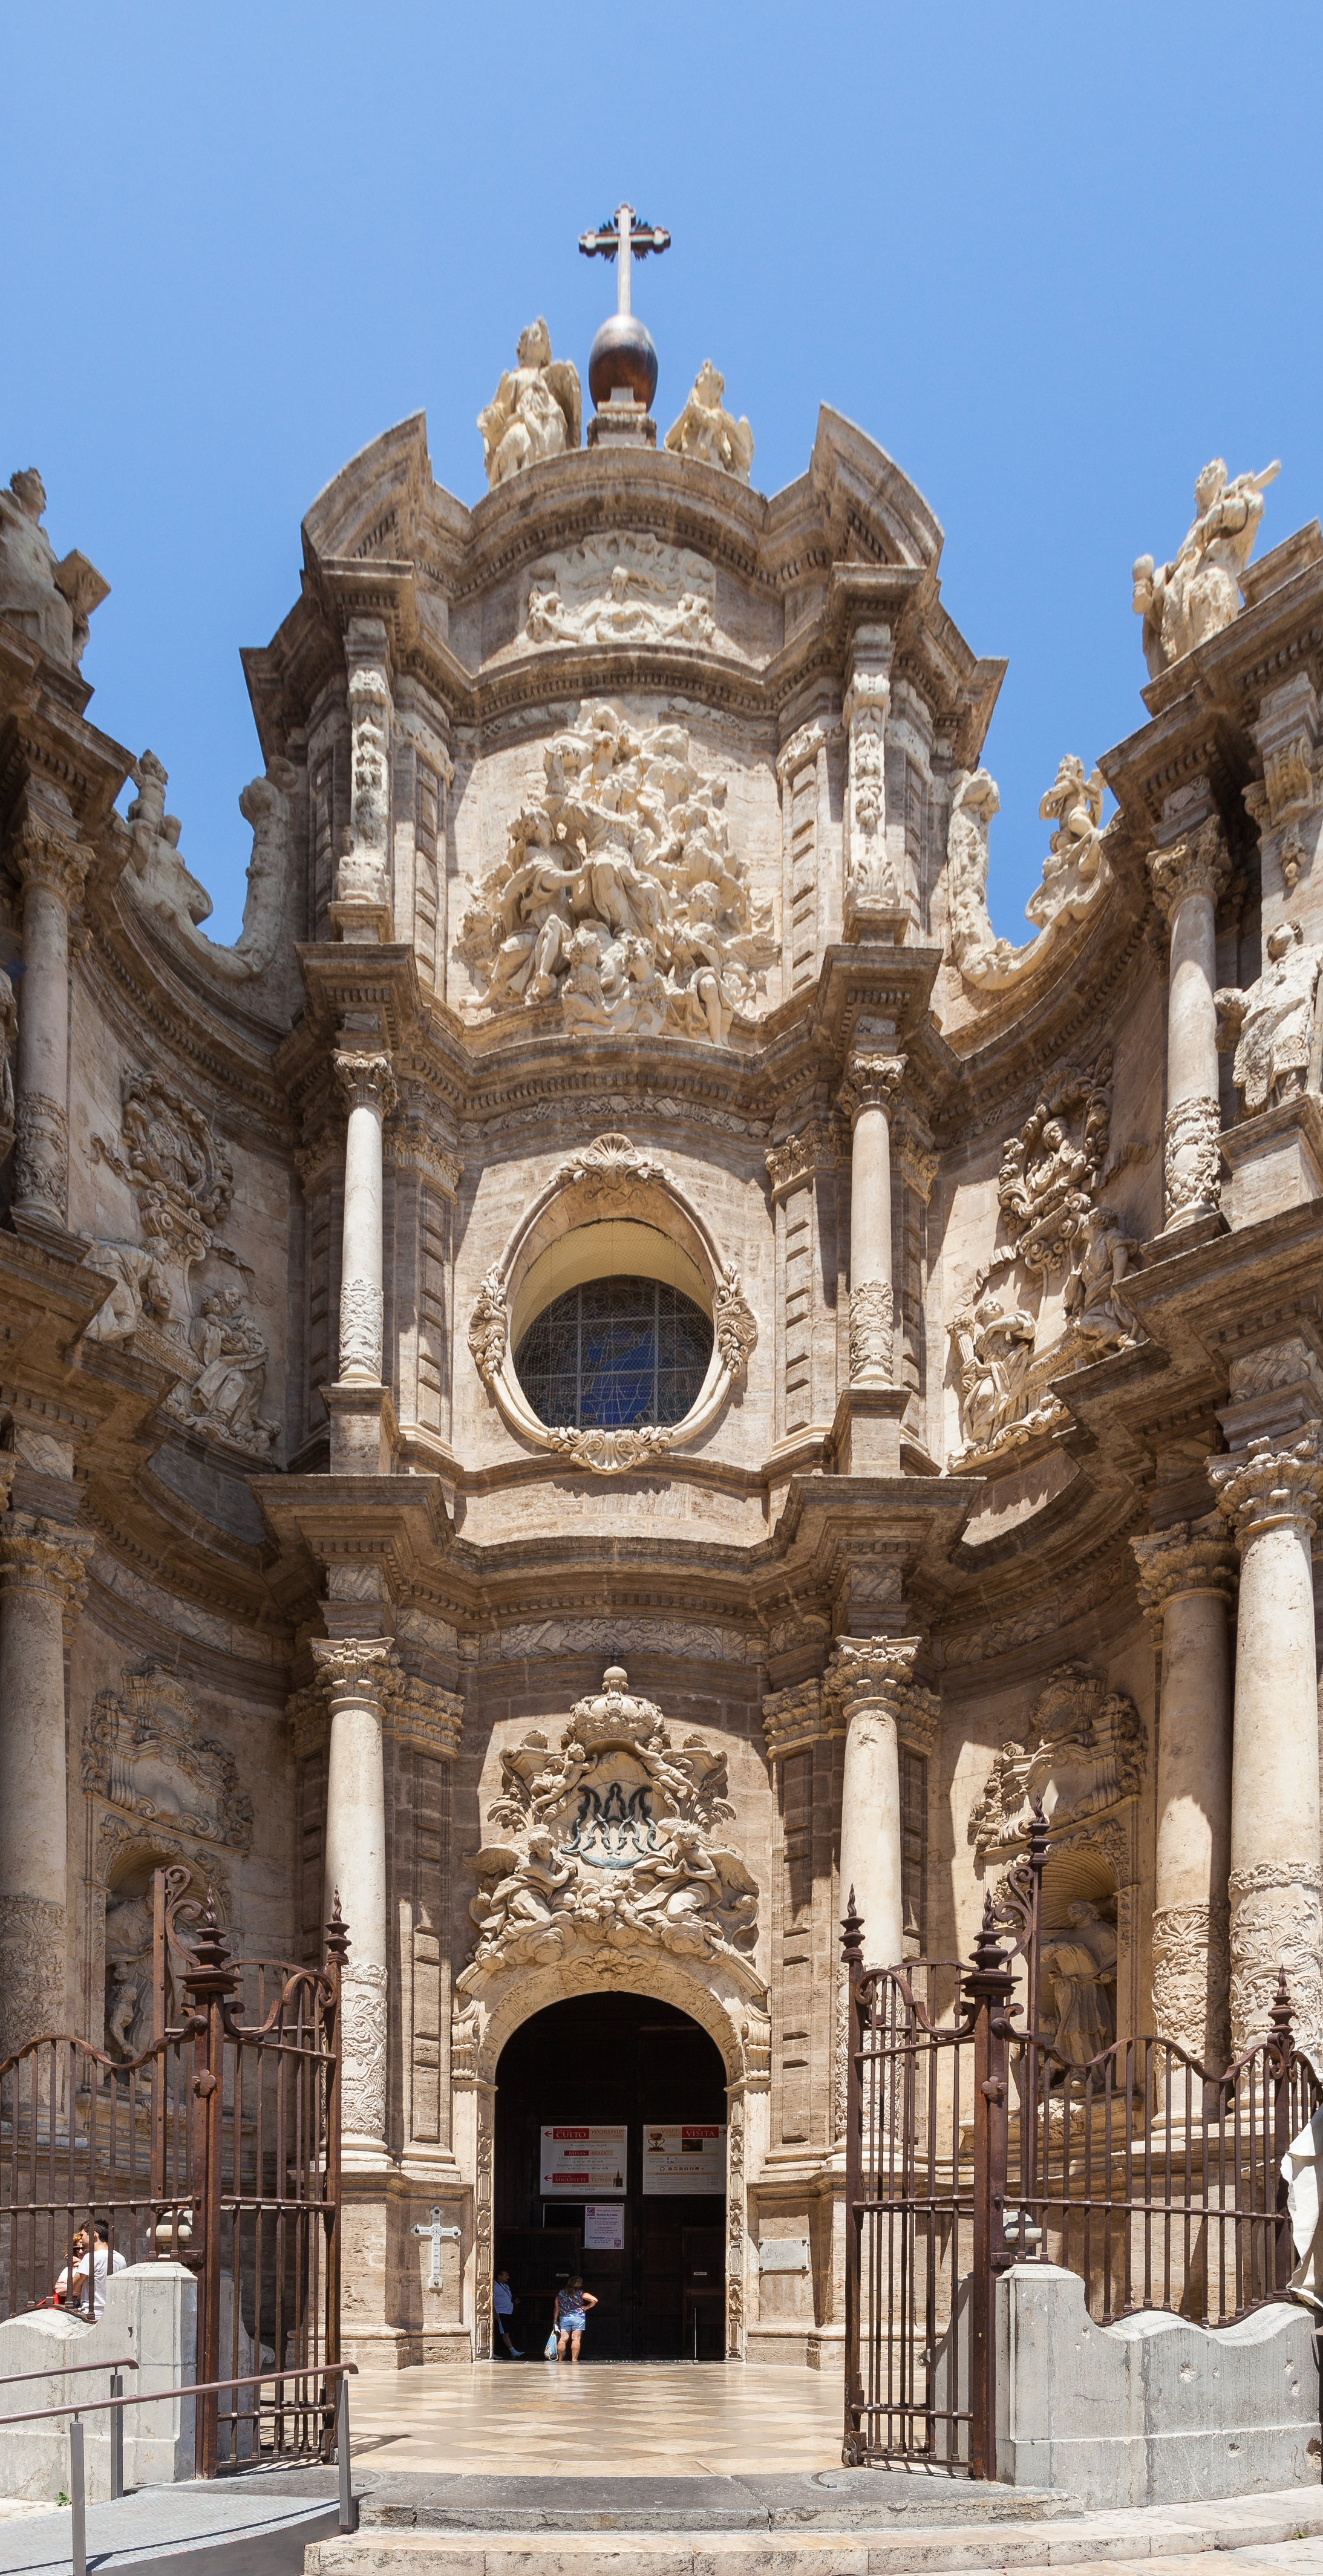 File:Catedral de Valencia, Valencia, España, 2014-06-30, DD 144.JPG - Wikimed...